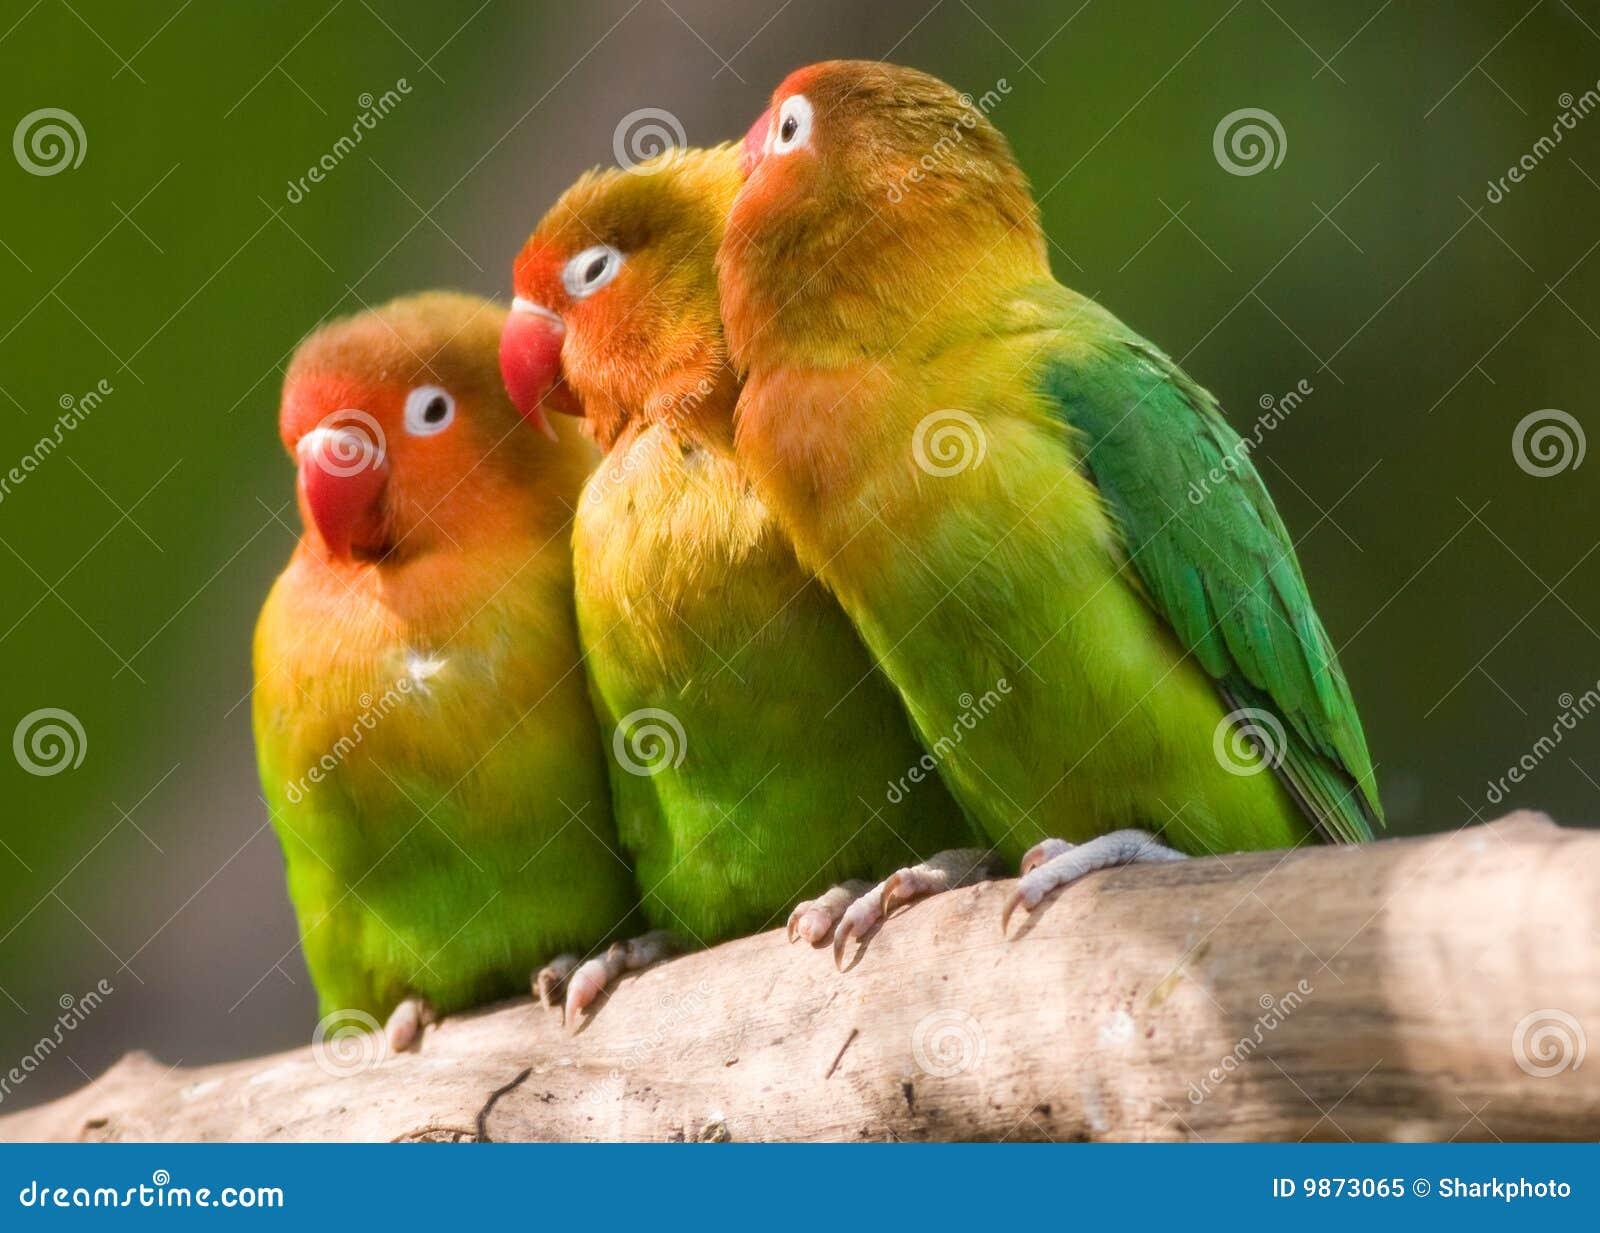 The Three Lovebirds